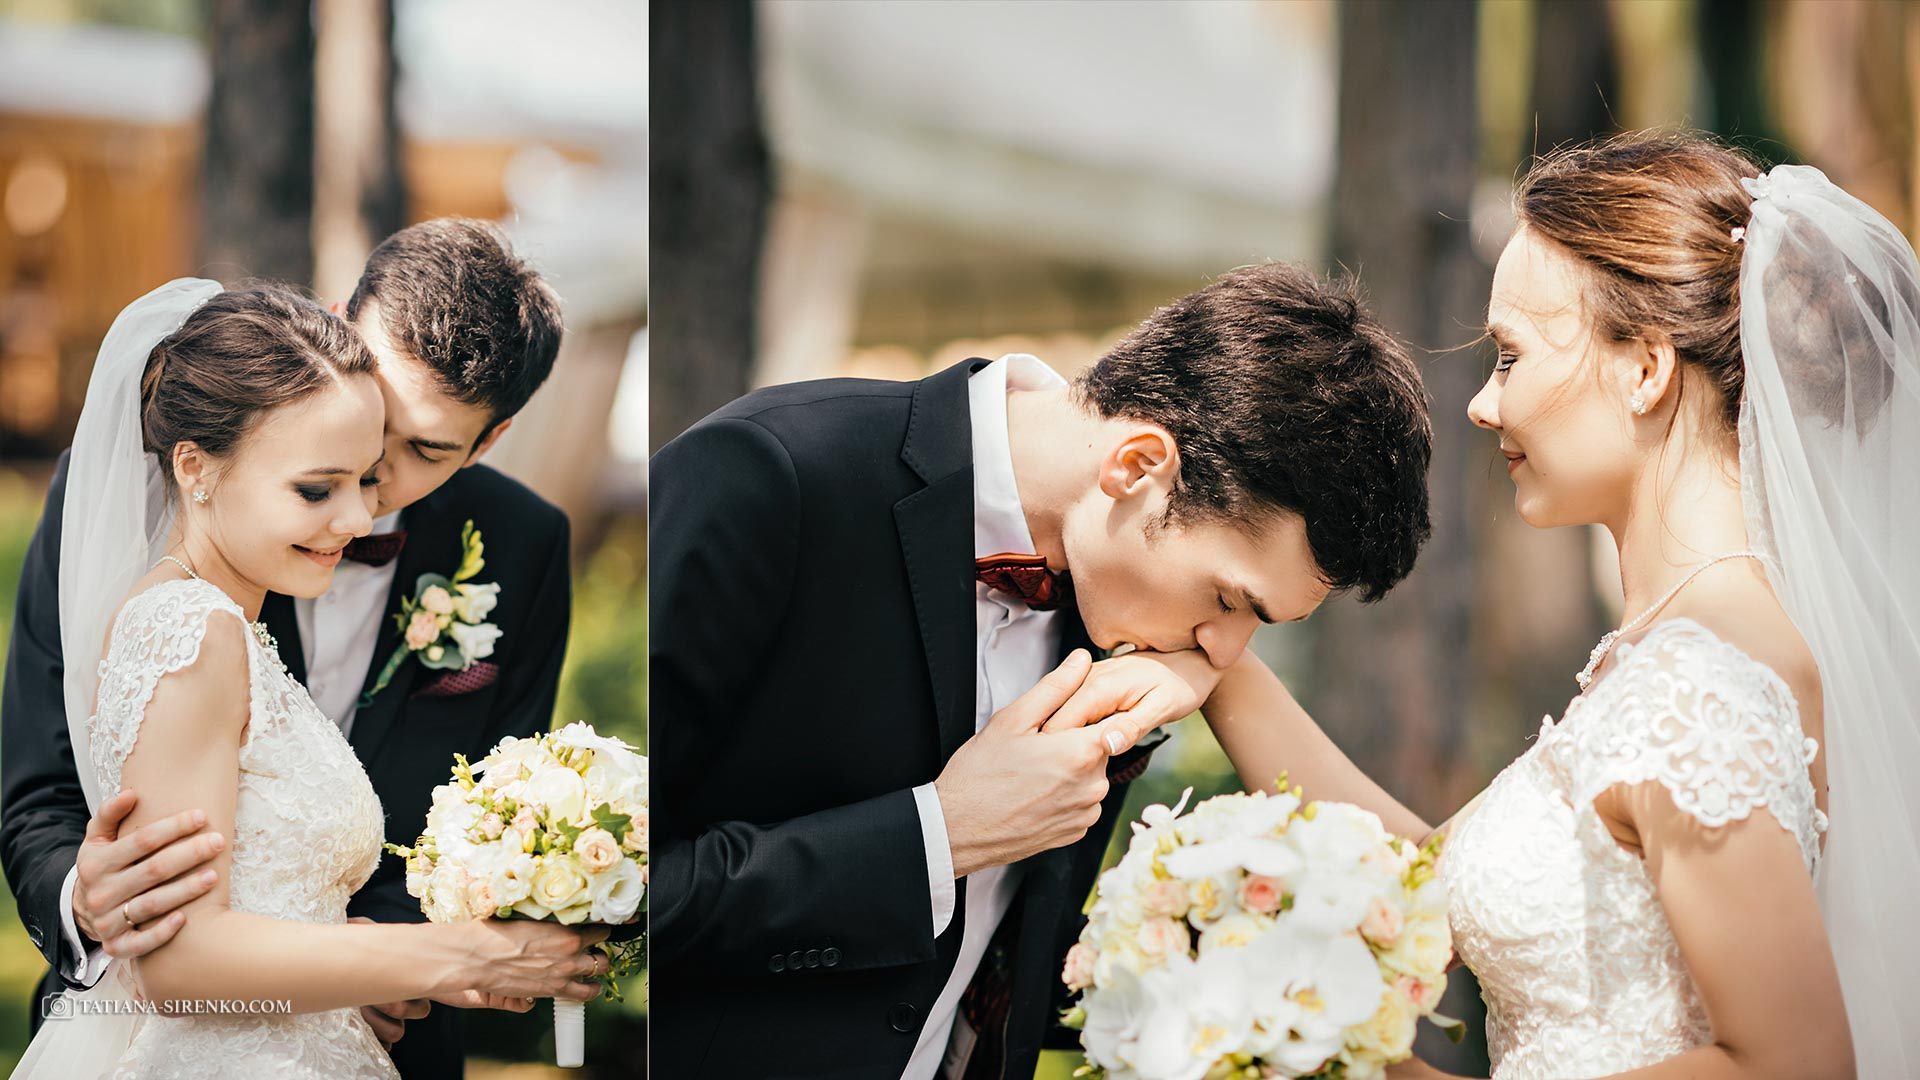 Ресторан триполье свадьба